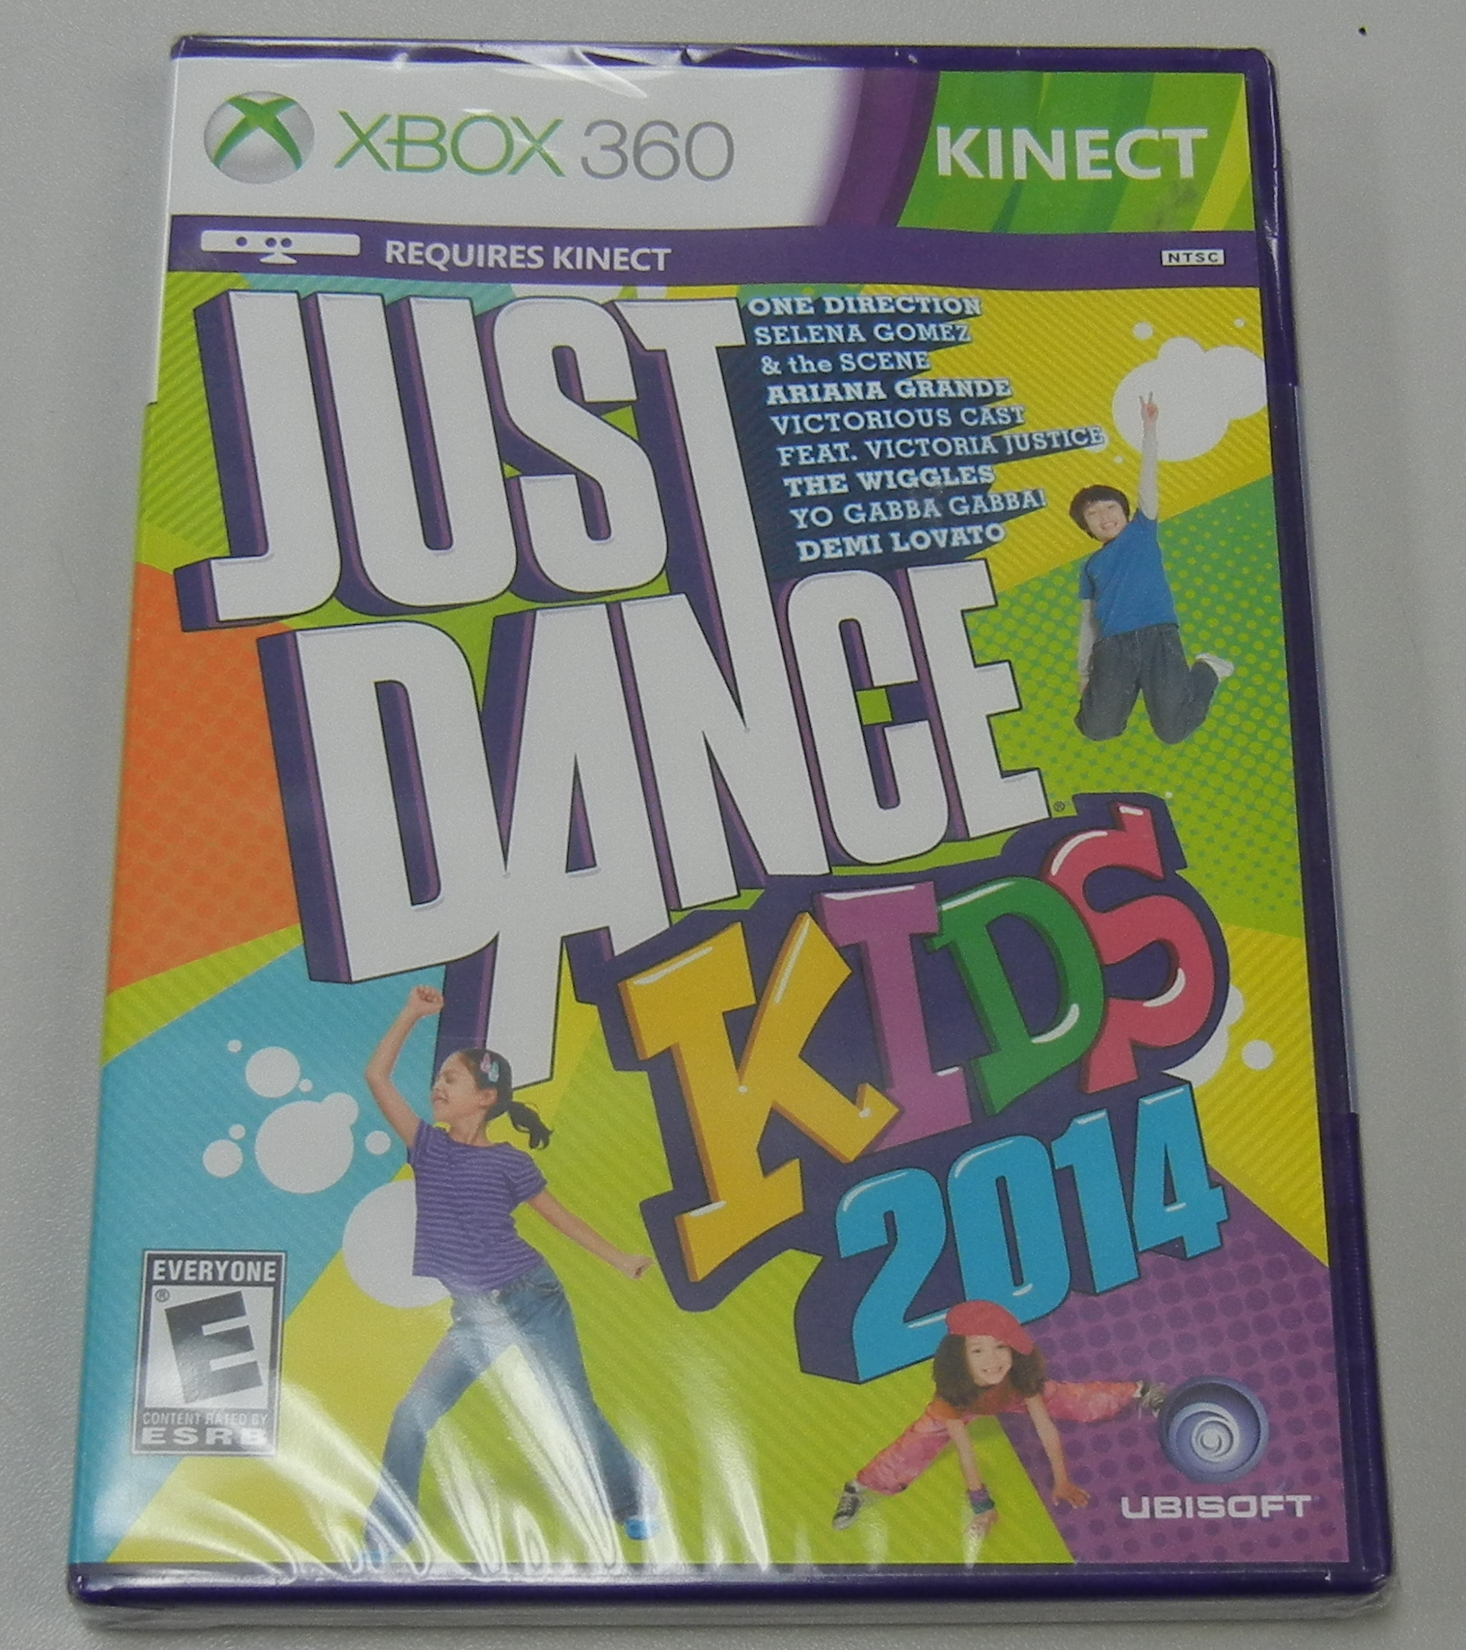 JUST DANCE KIDS 2014 XBOX 360 GAME - BRAND NEW